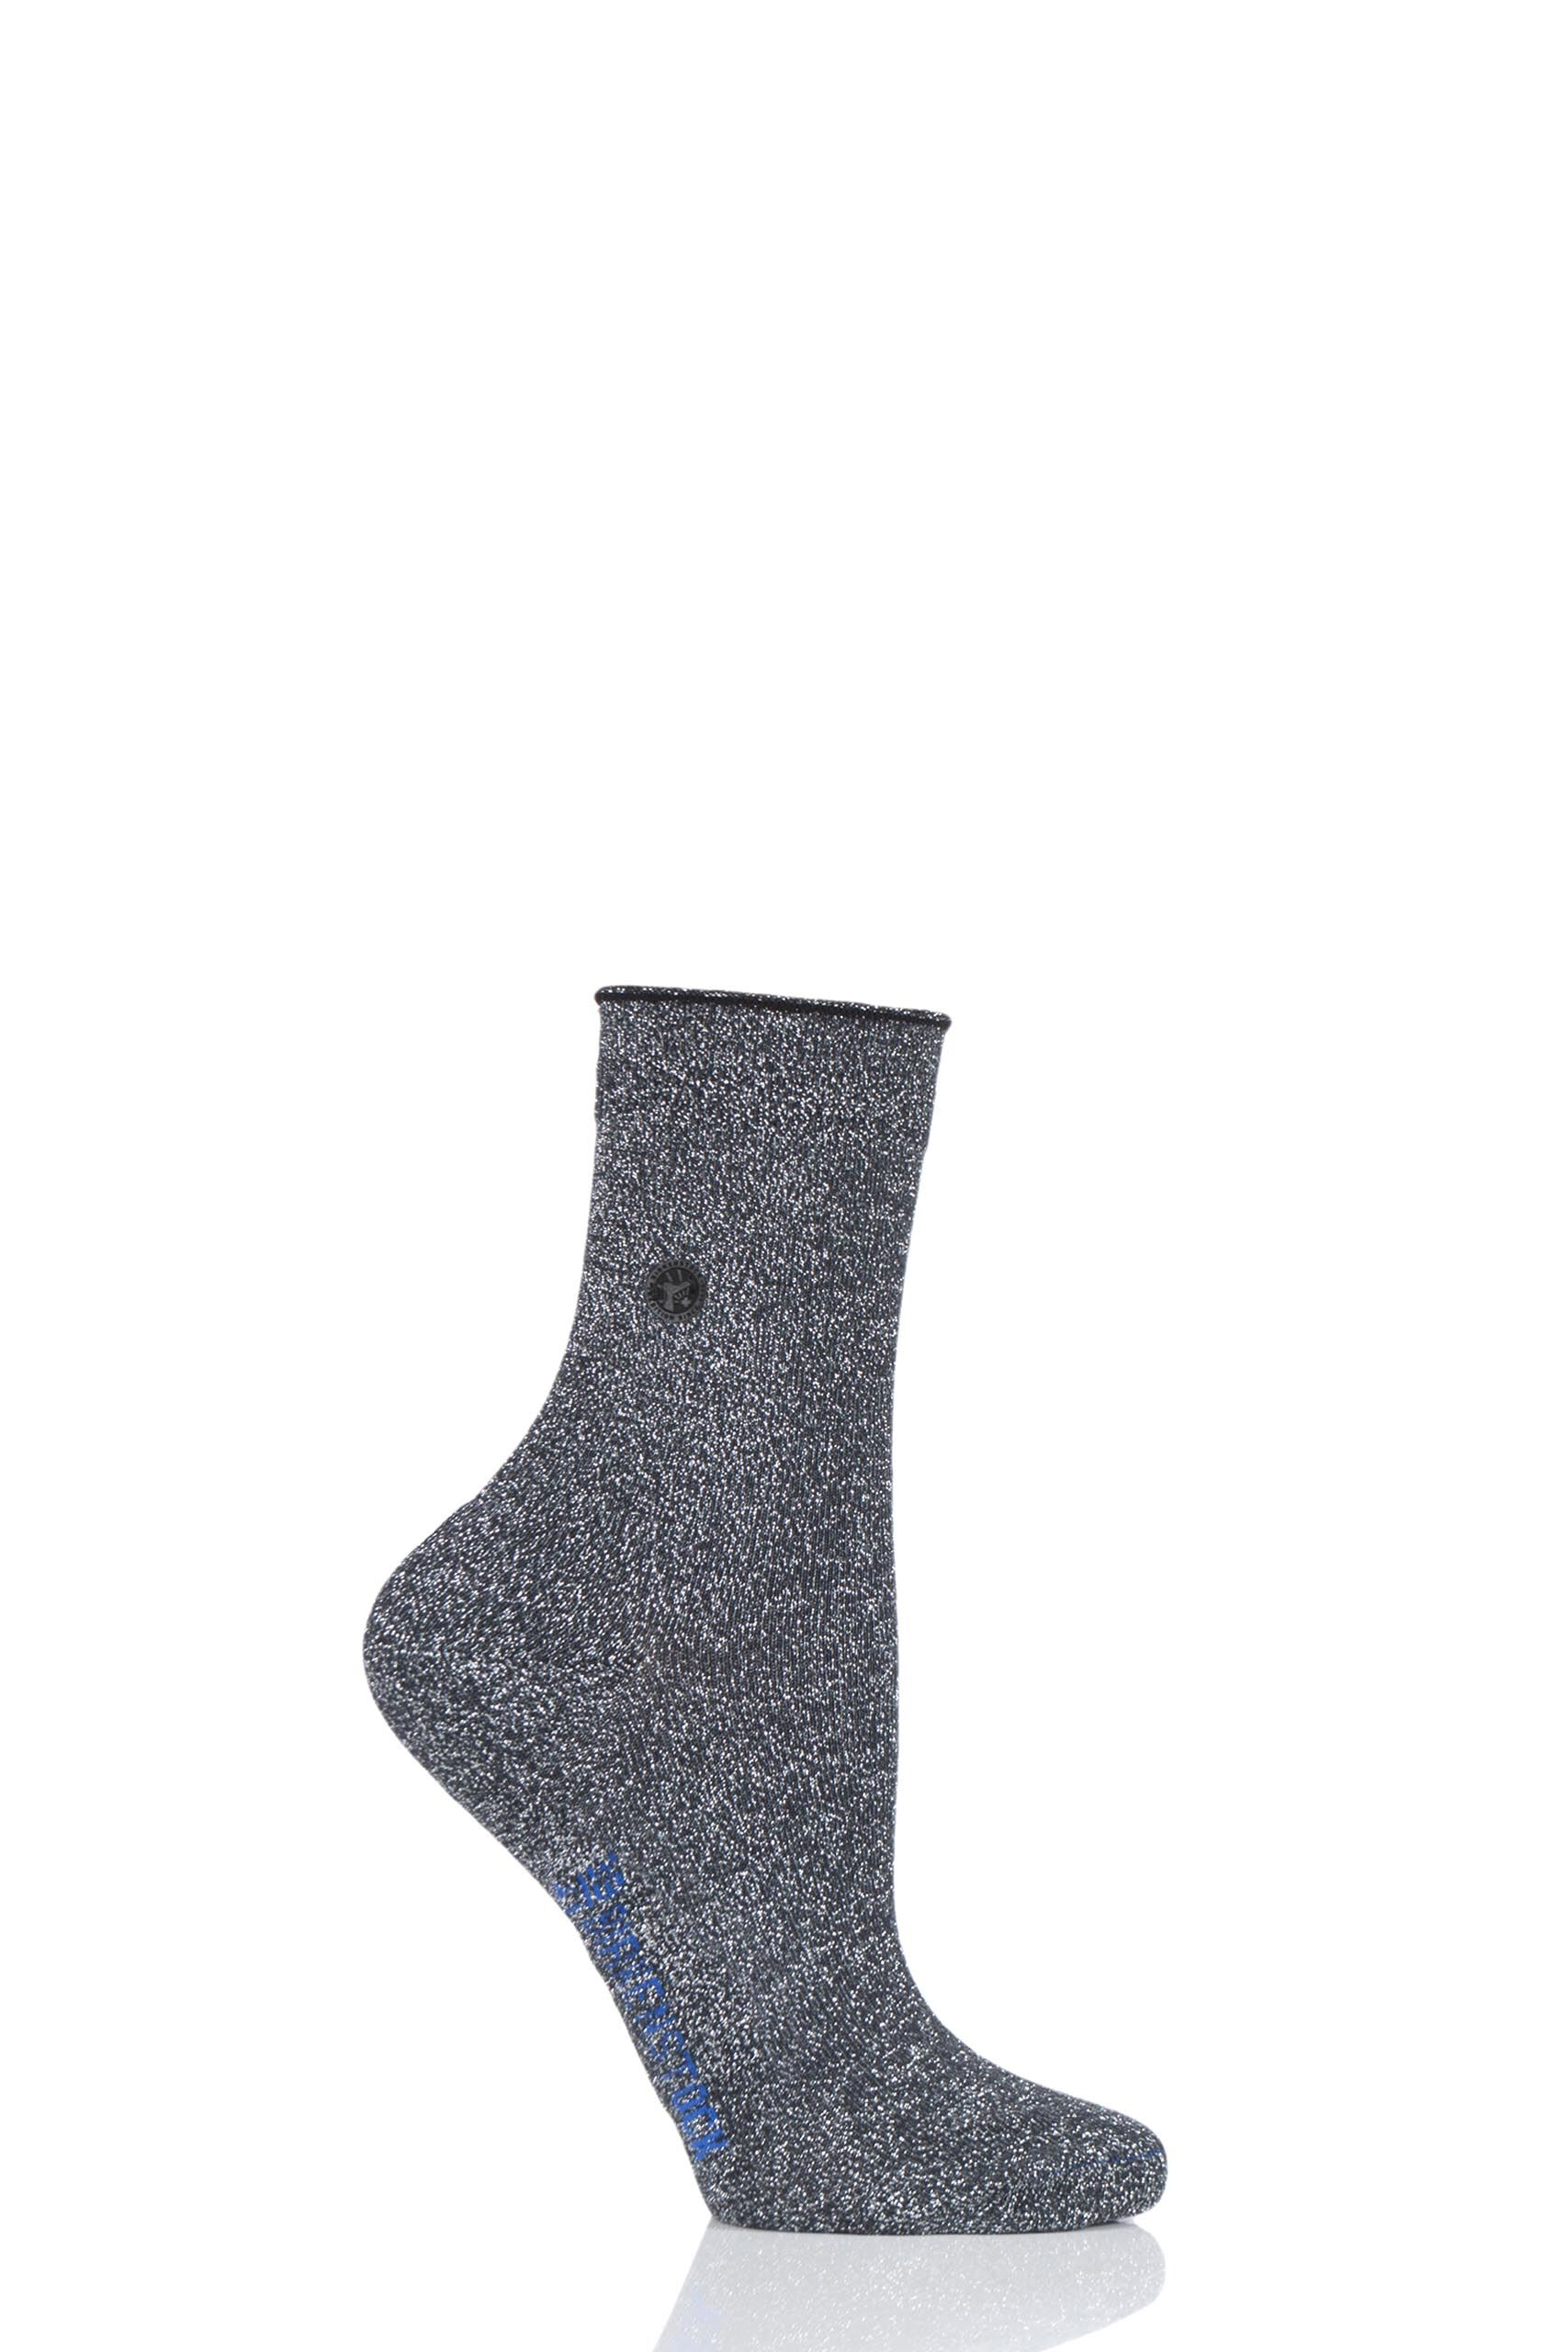 Image of 1 Pair Anthracite Cotton Sole Bling Socks Ladies 5.5-7.5 Ladies - Birkenstock